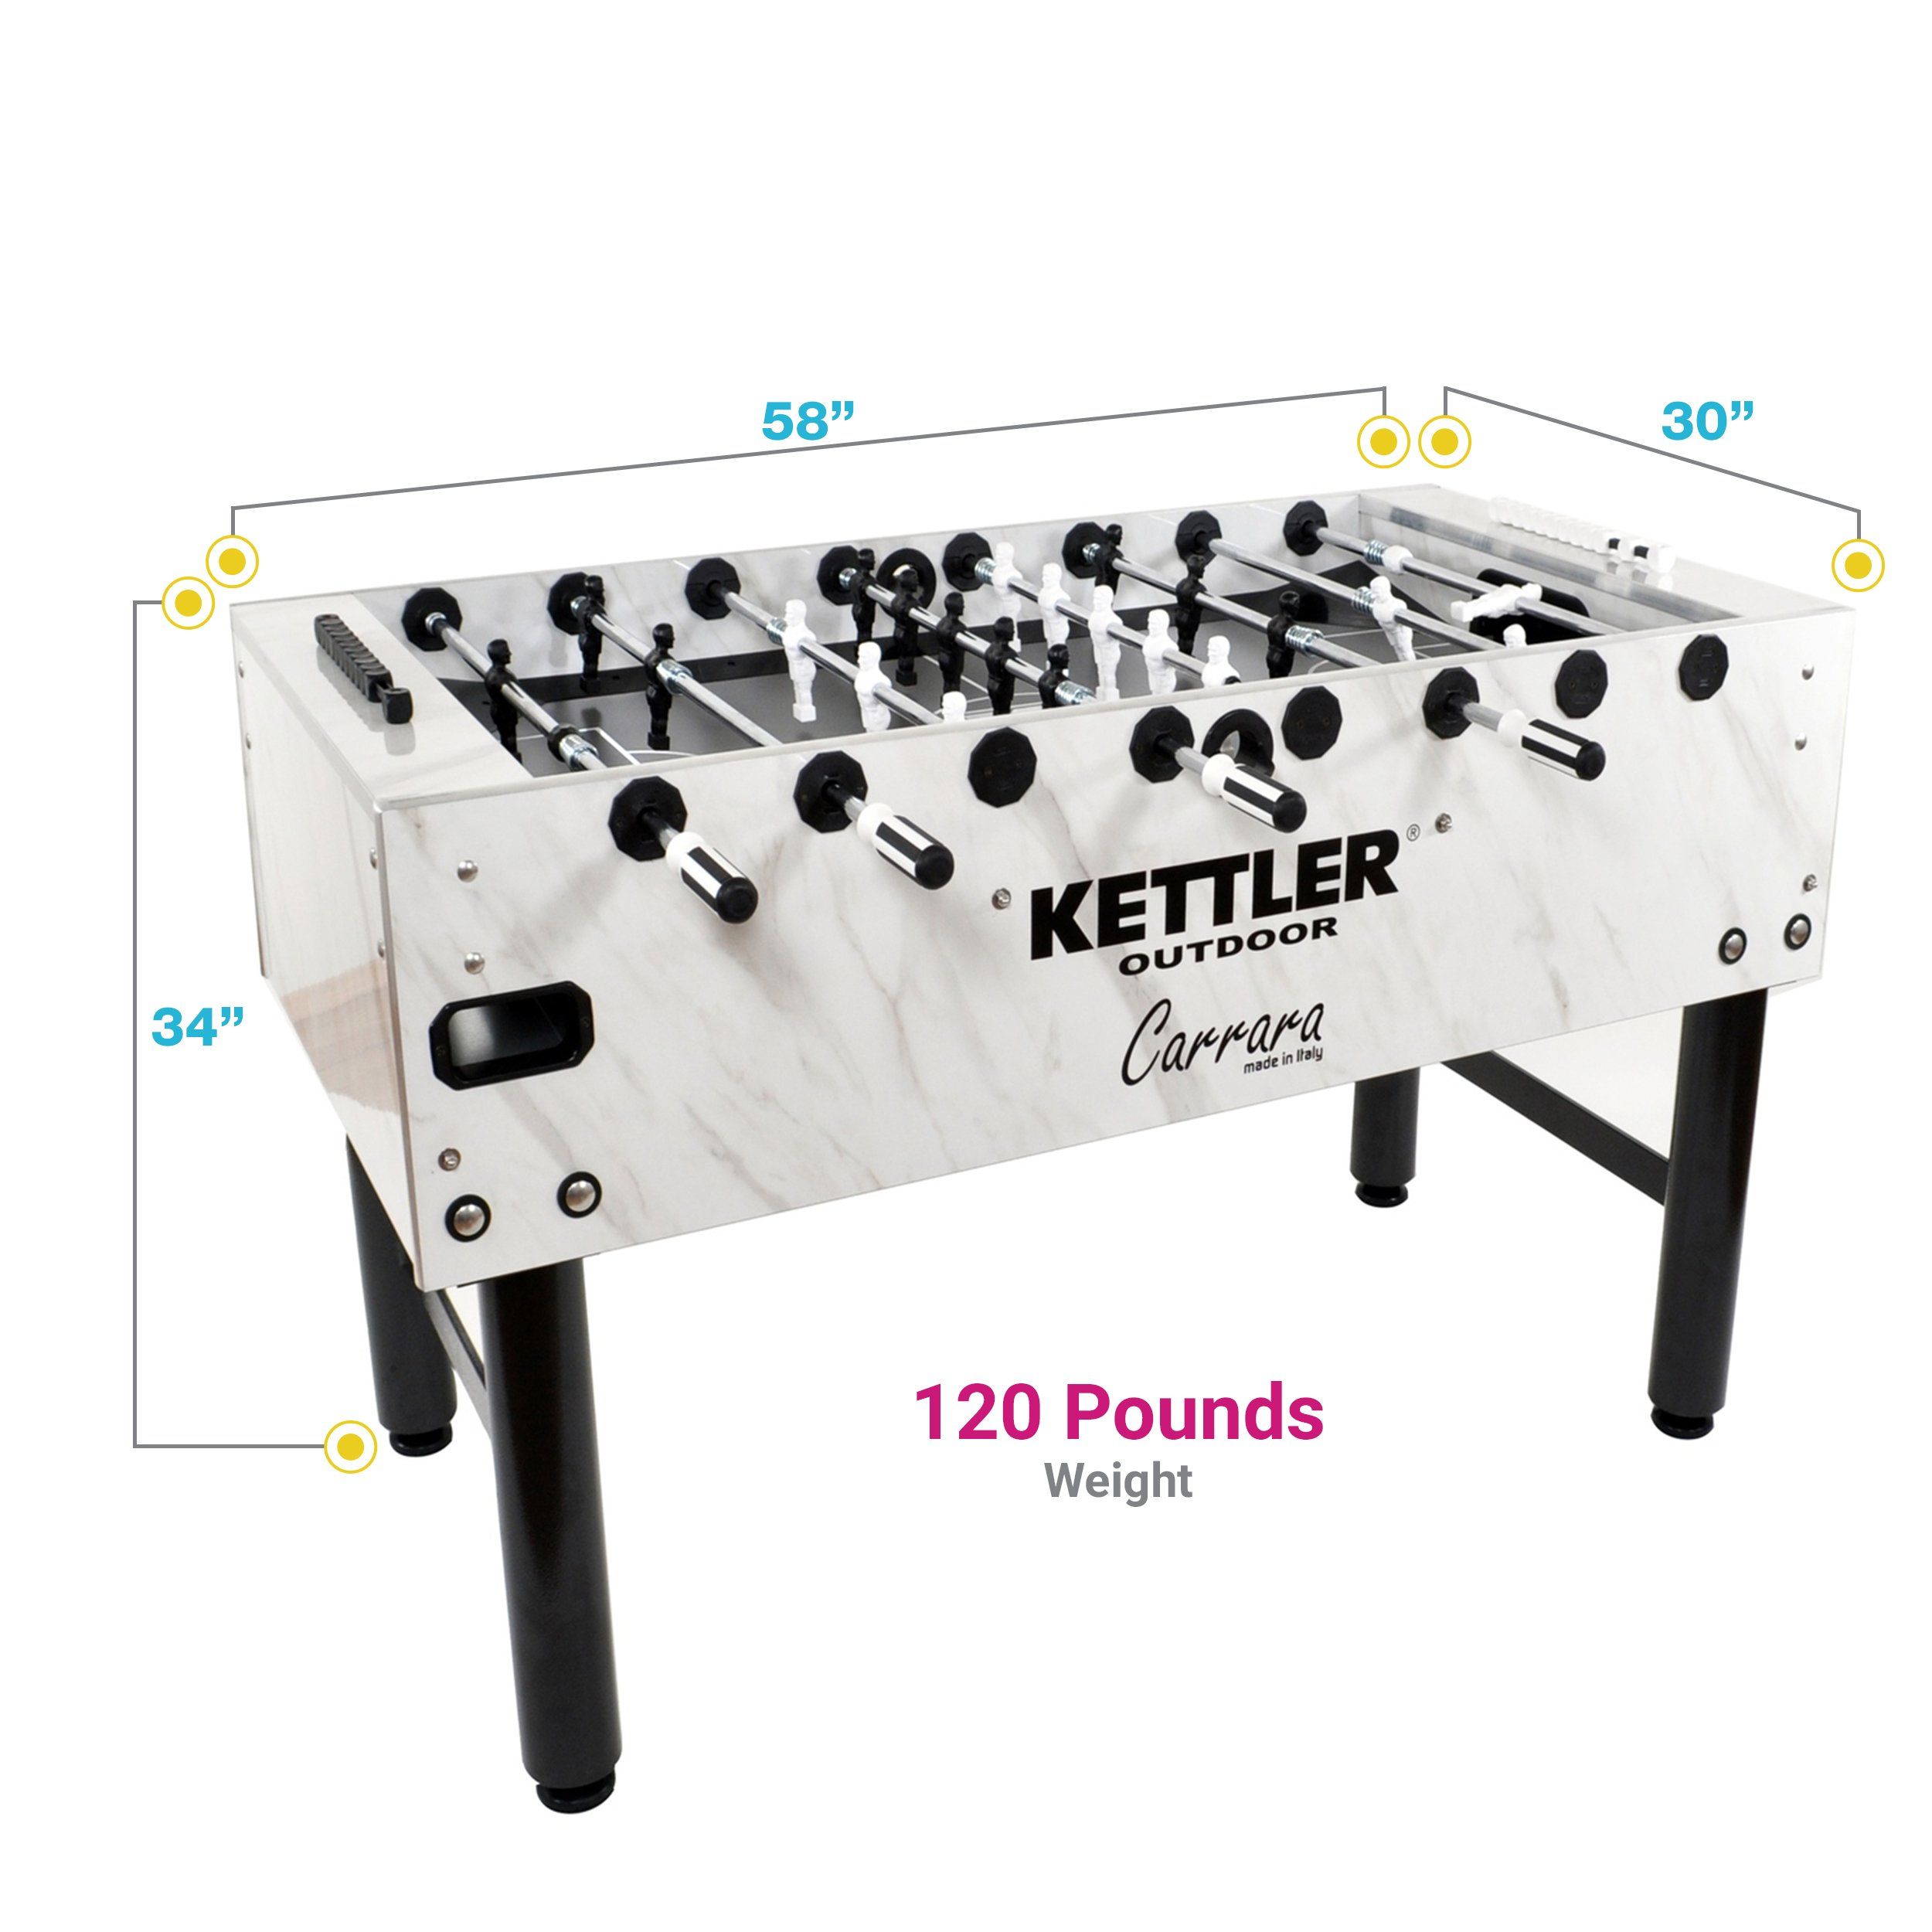 13. Kettler Foosball Table – The Carrara Model for Outdoors